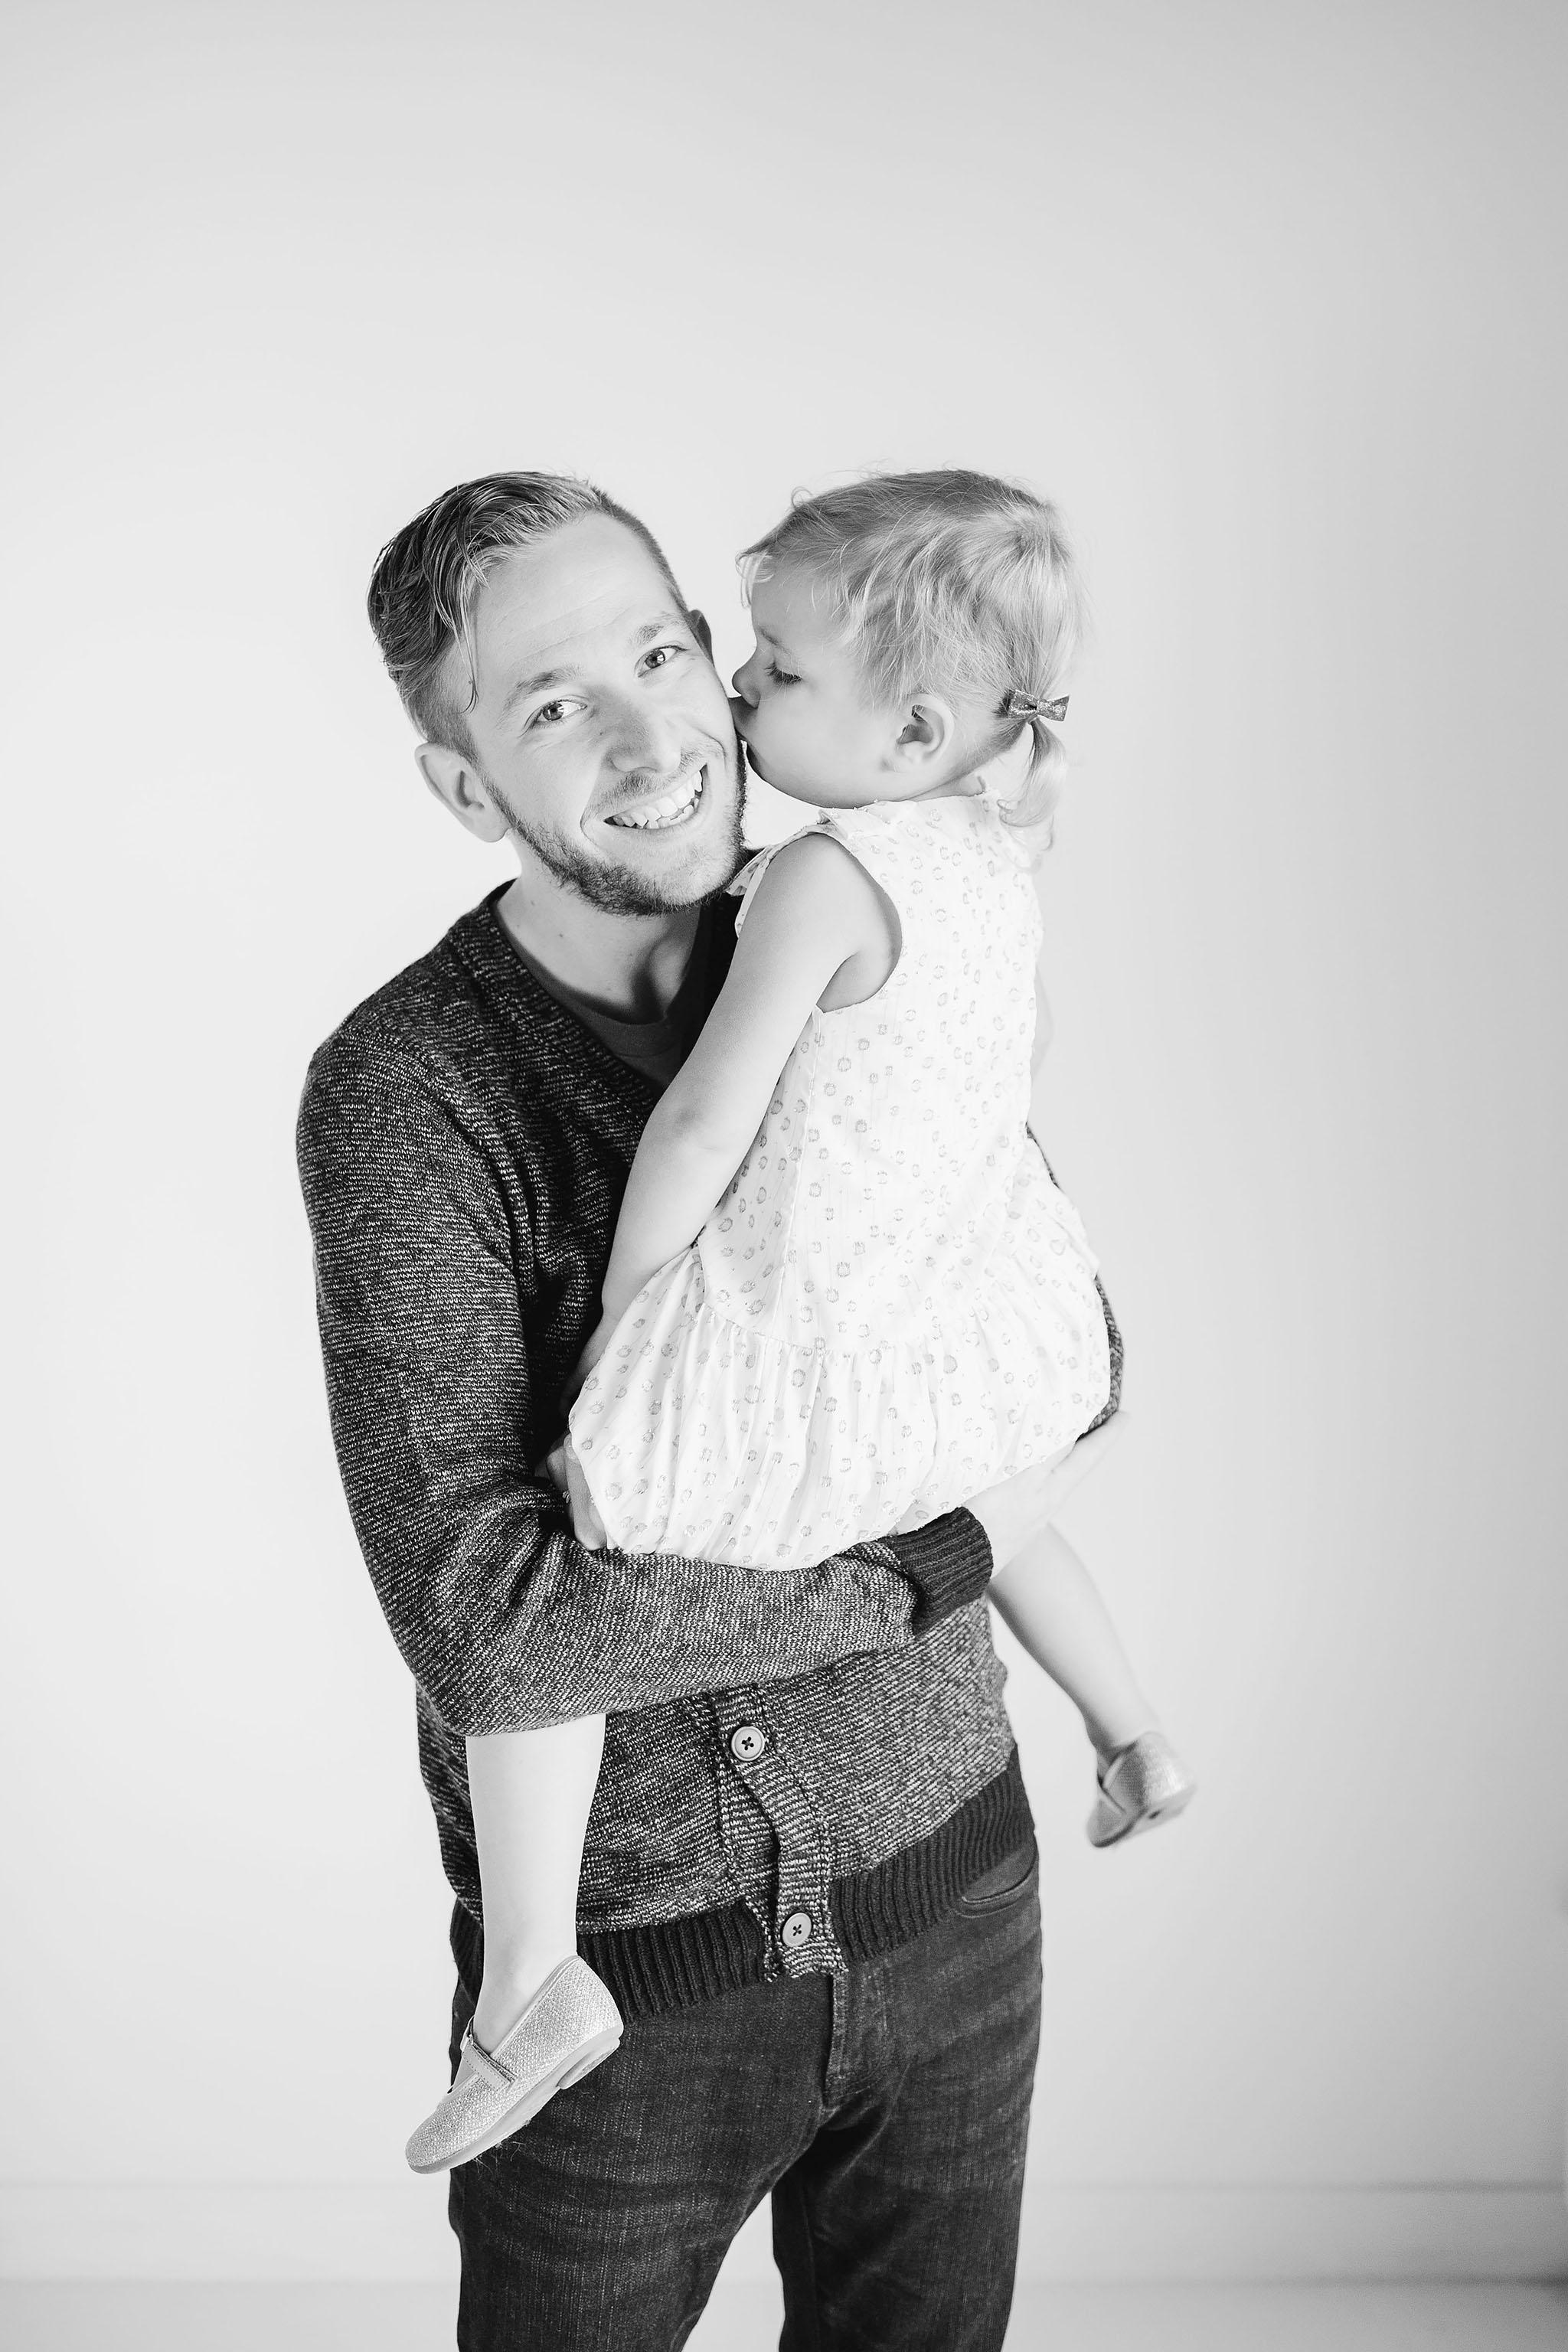 london_ontario_family_photographer-studio_photography-studio_lifestyle_portraits-white_studio-mother_son-candid_family_photography-raw_footage_photography045.jpg